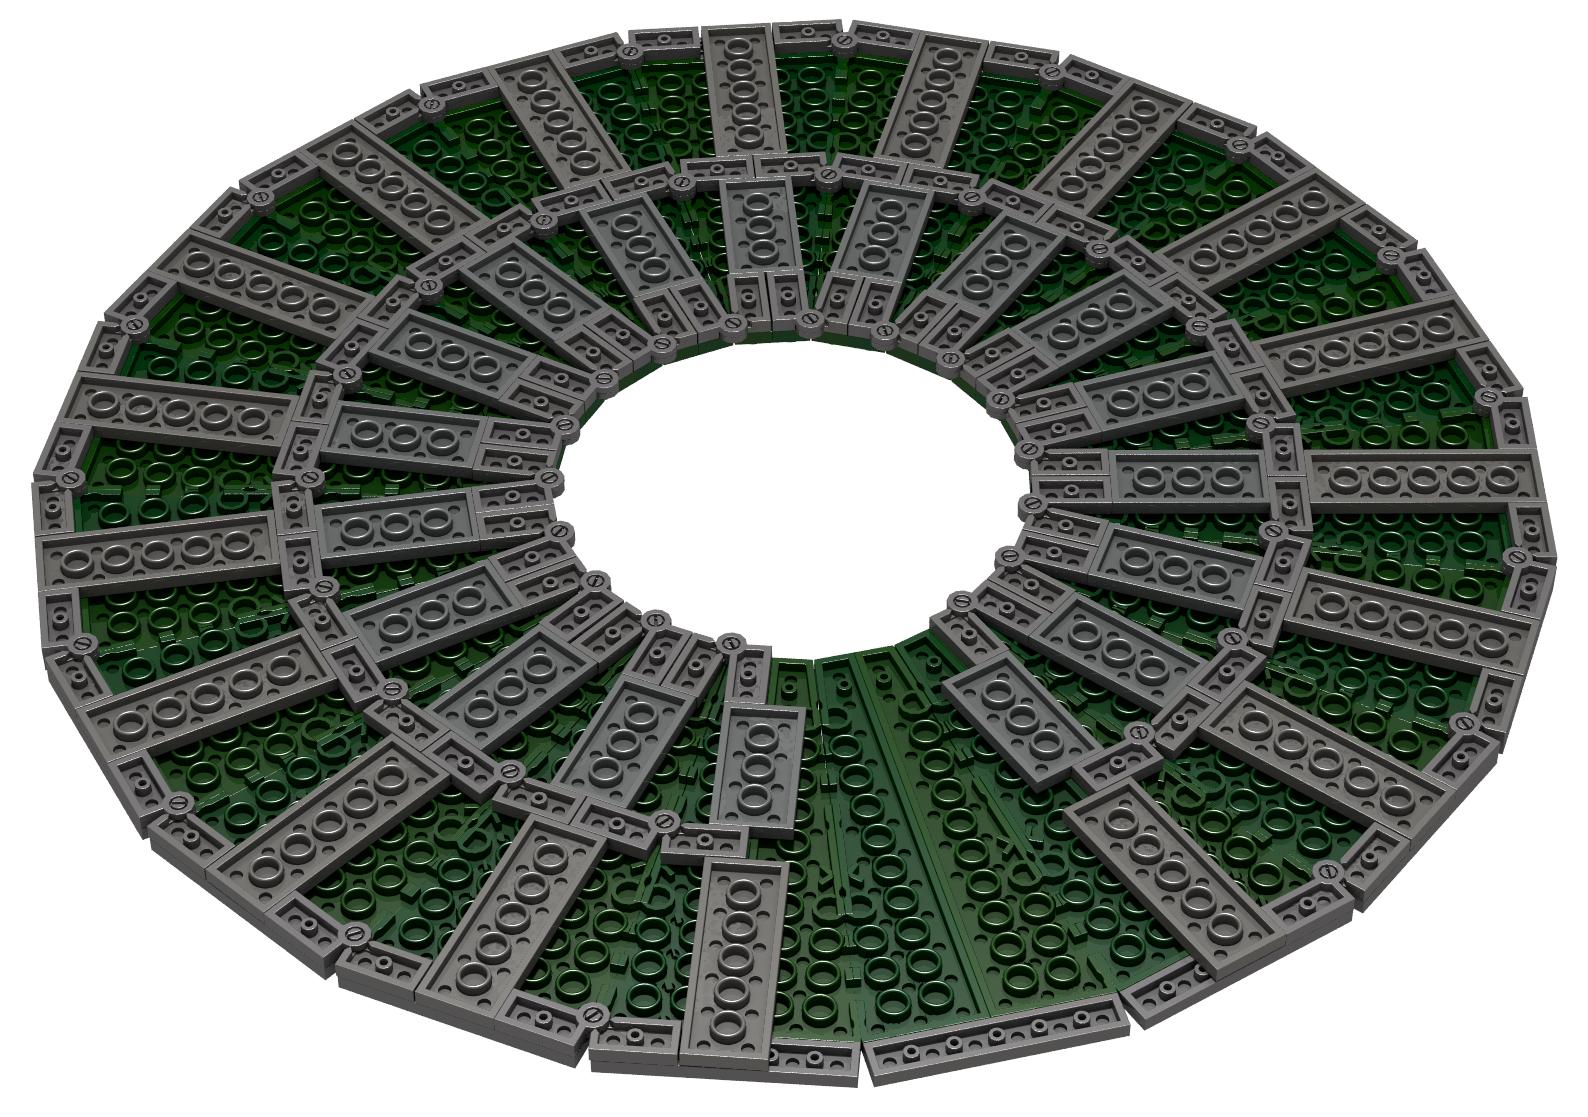 Circular base